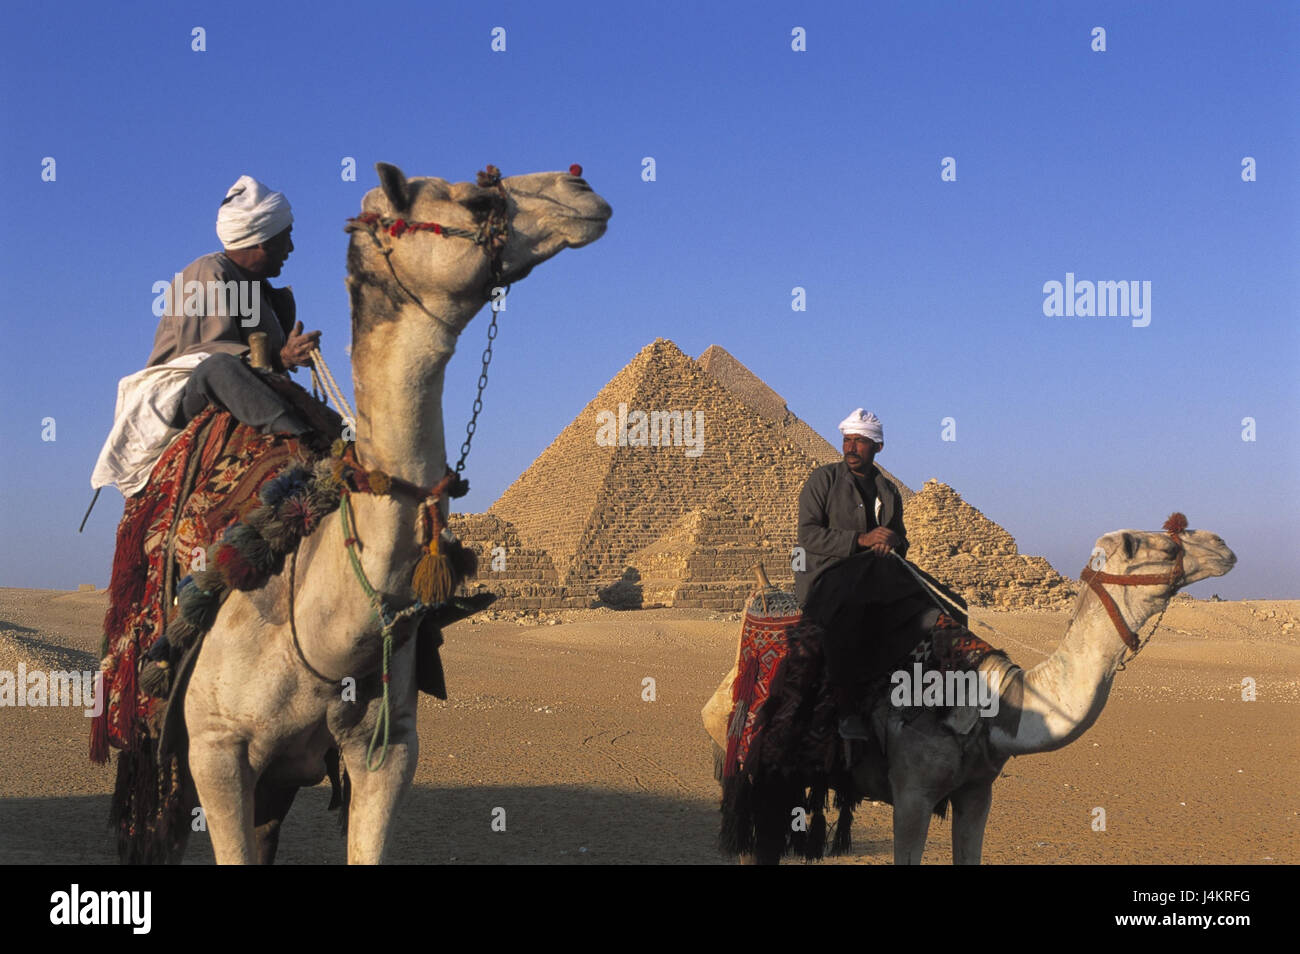 Egypt, Gizeh, pyramids, camel bleeds outside, Africa, East, Giseh, Gise, Giza, Al-Giza, El-Giseh, pyramids, place - Stock Image